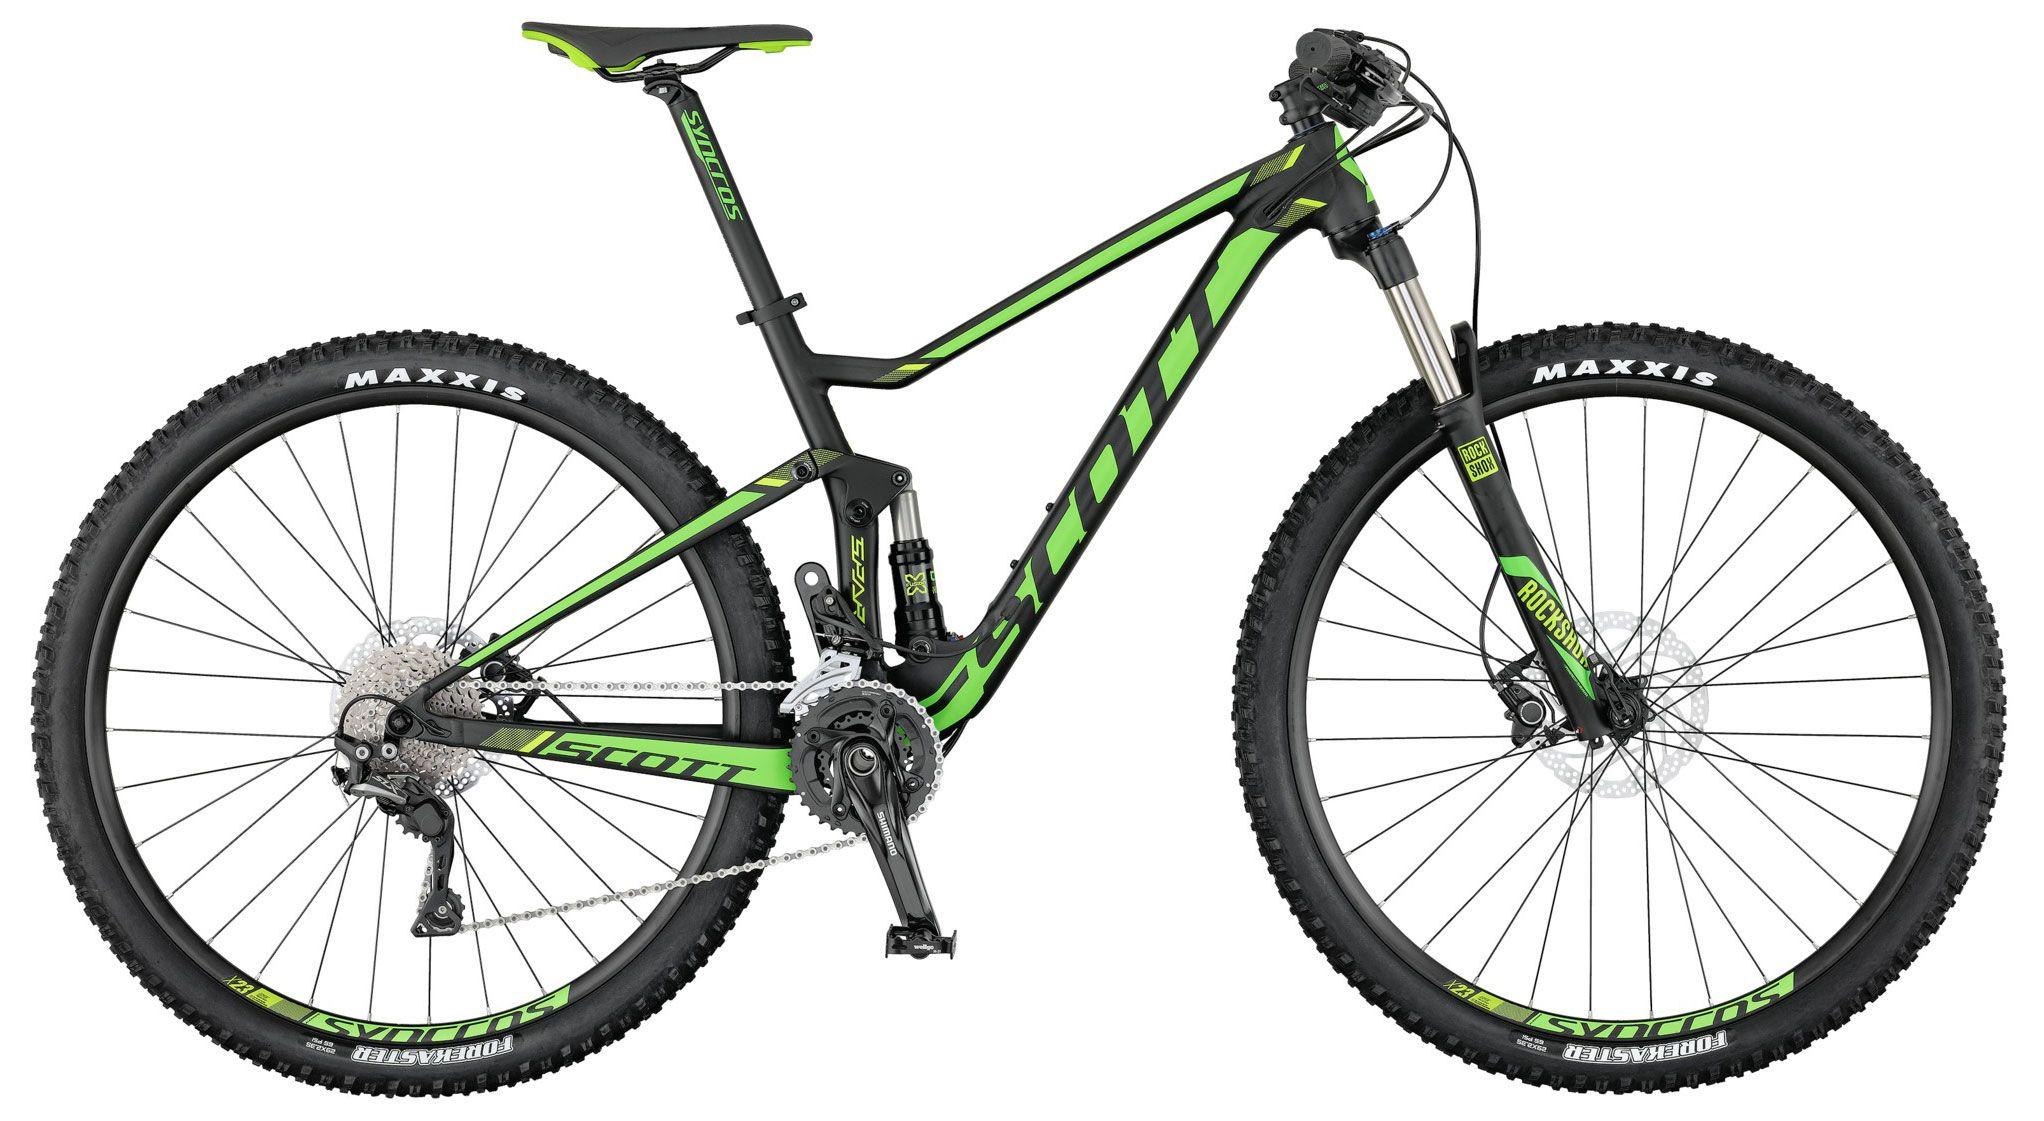 Велосипед Scott Spark 760 2017,  Двухподвесы  - артикул:275878